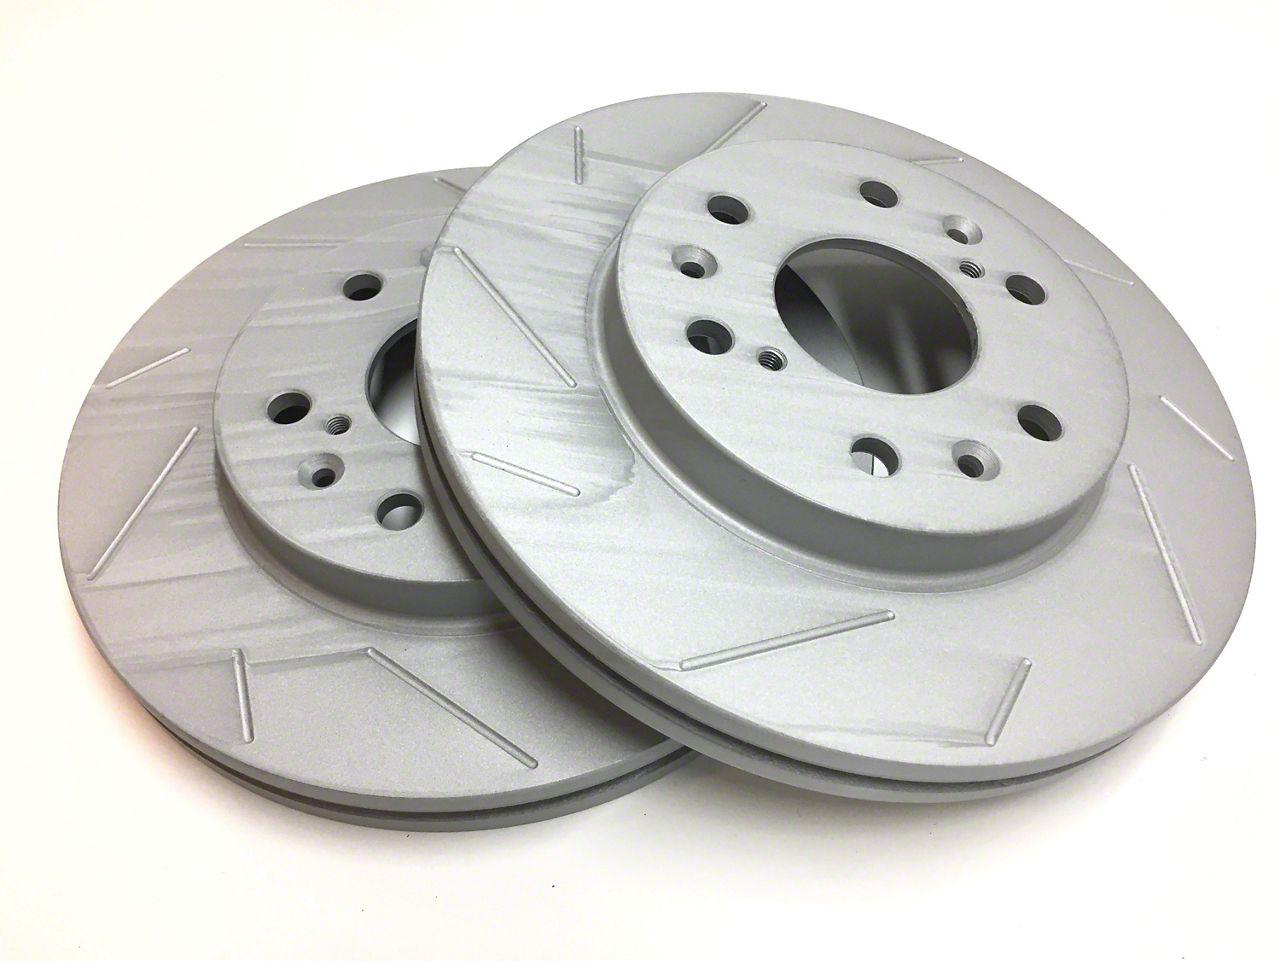 SP Performance Slotted Rotors w/ Gray ZRC - Rear Pair (07-18 Jeep Wrangler JK)